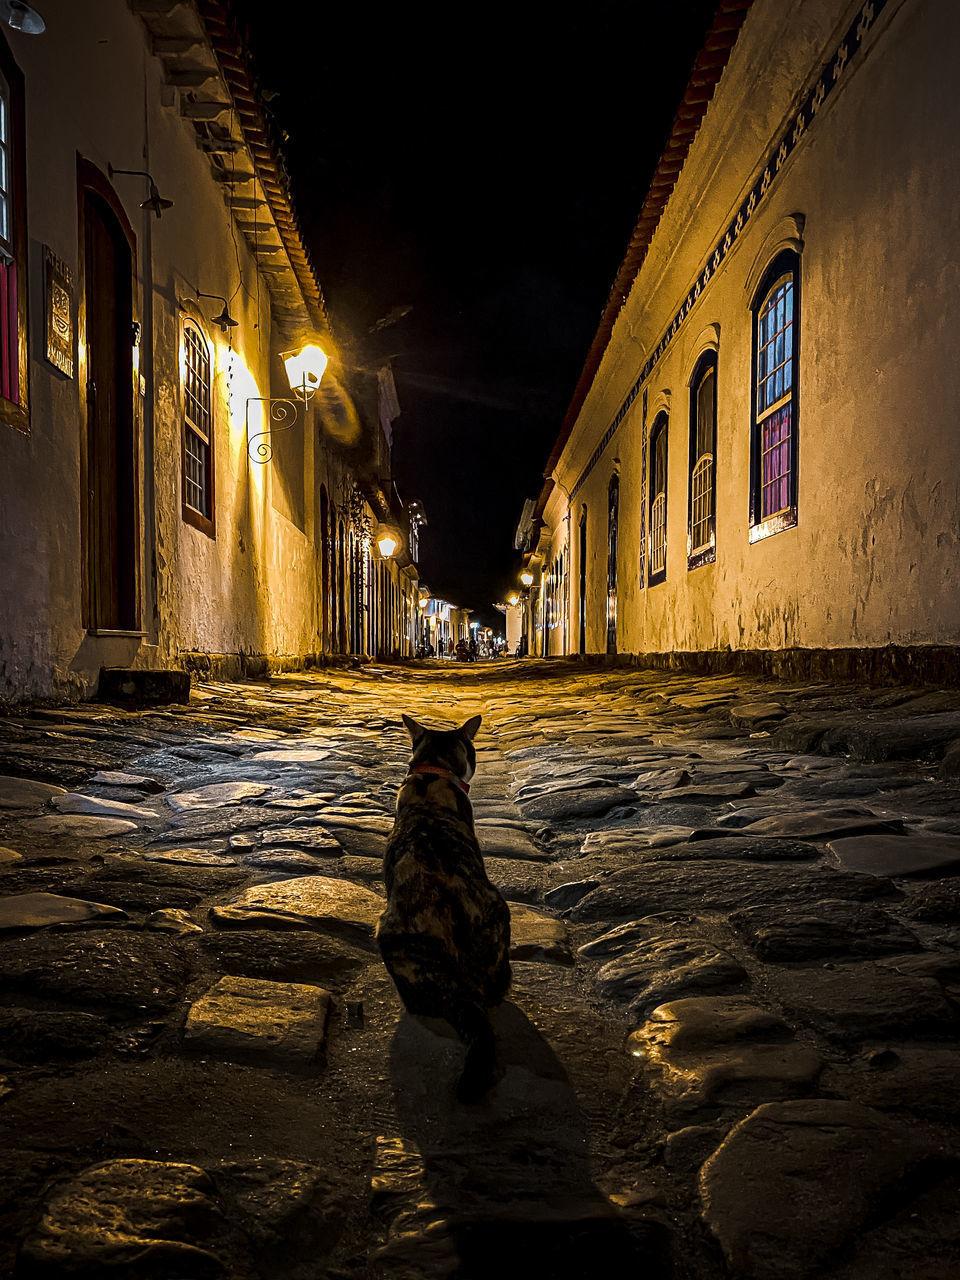 FOOTPATH BY STREET AGAINST BUILDINGS AT NIGHT